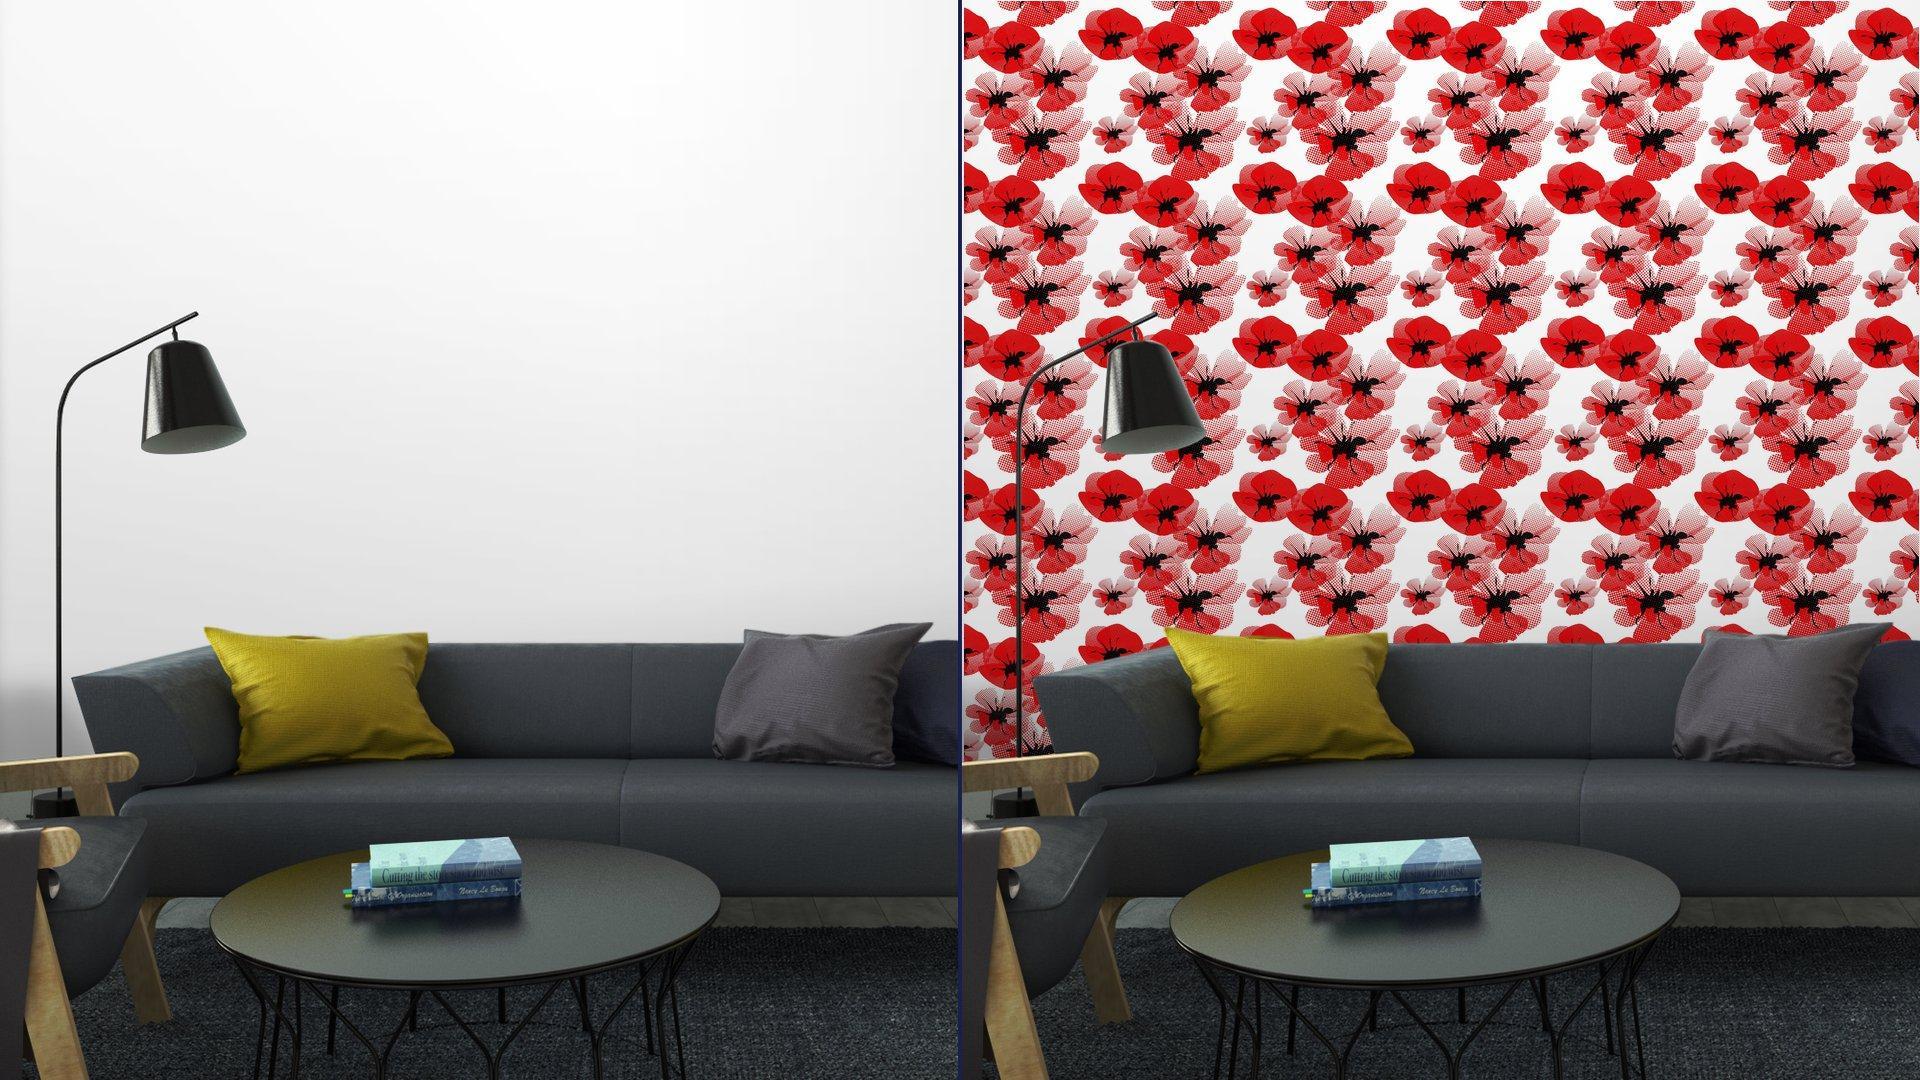 Fotomurales mexico papeles pintados autoadhesivos patron floral sin fisuras con amapola 3 - Papel Tapiz Floral Amapola Roja en Fondo Blanco